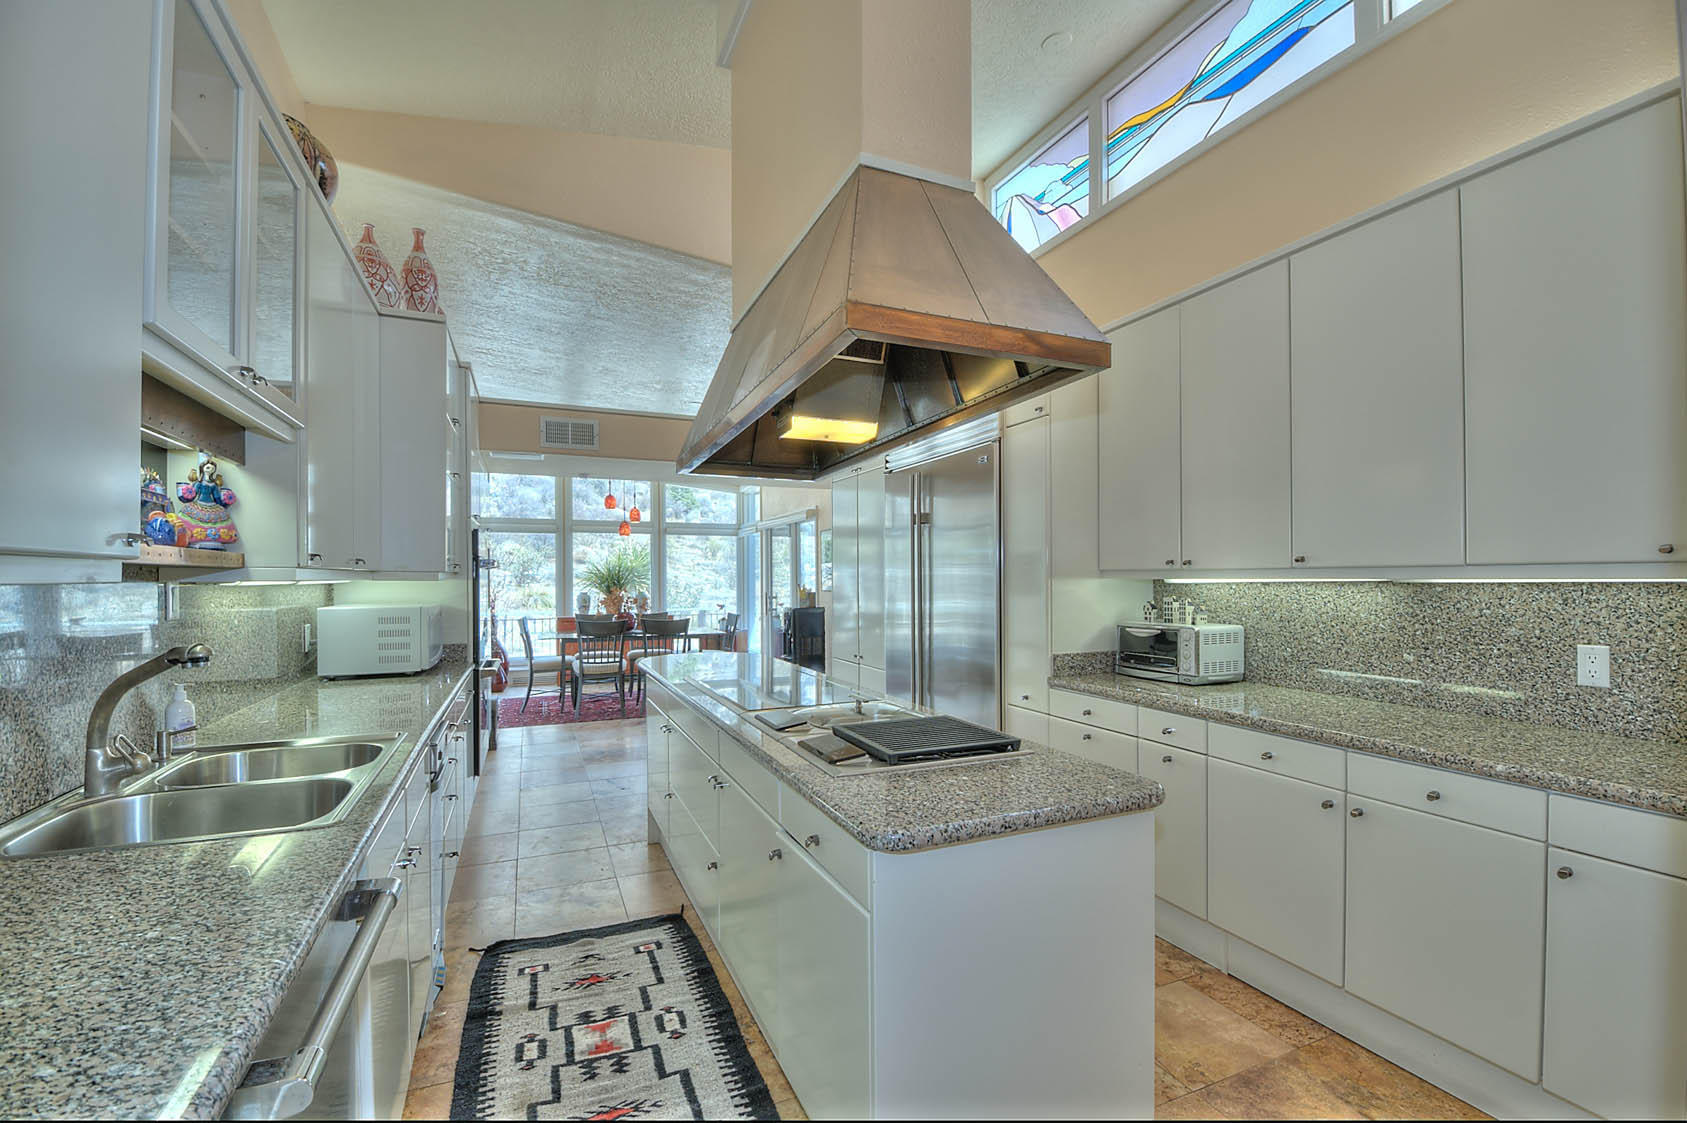 Listing: 9 Sandia Heights Drive NE, Albuquerque, NM.| MLS# 916302 ...